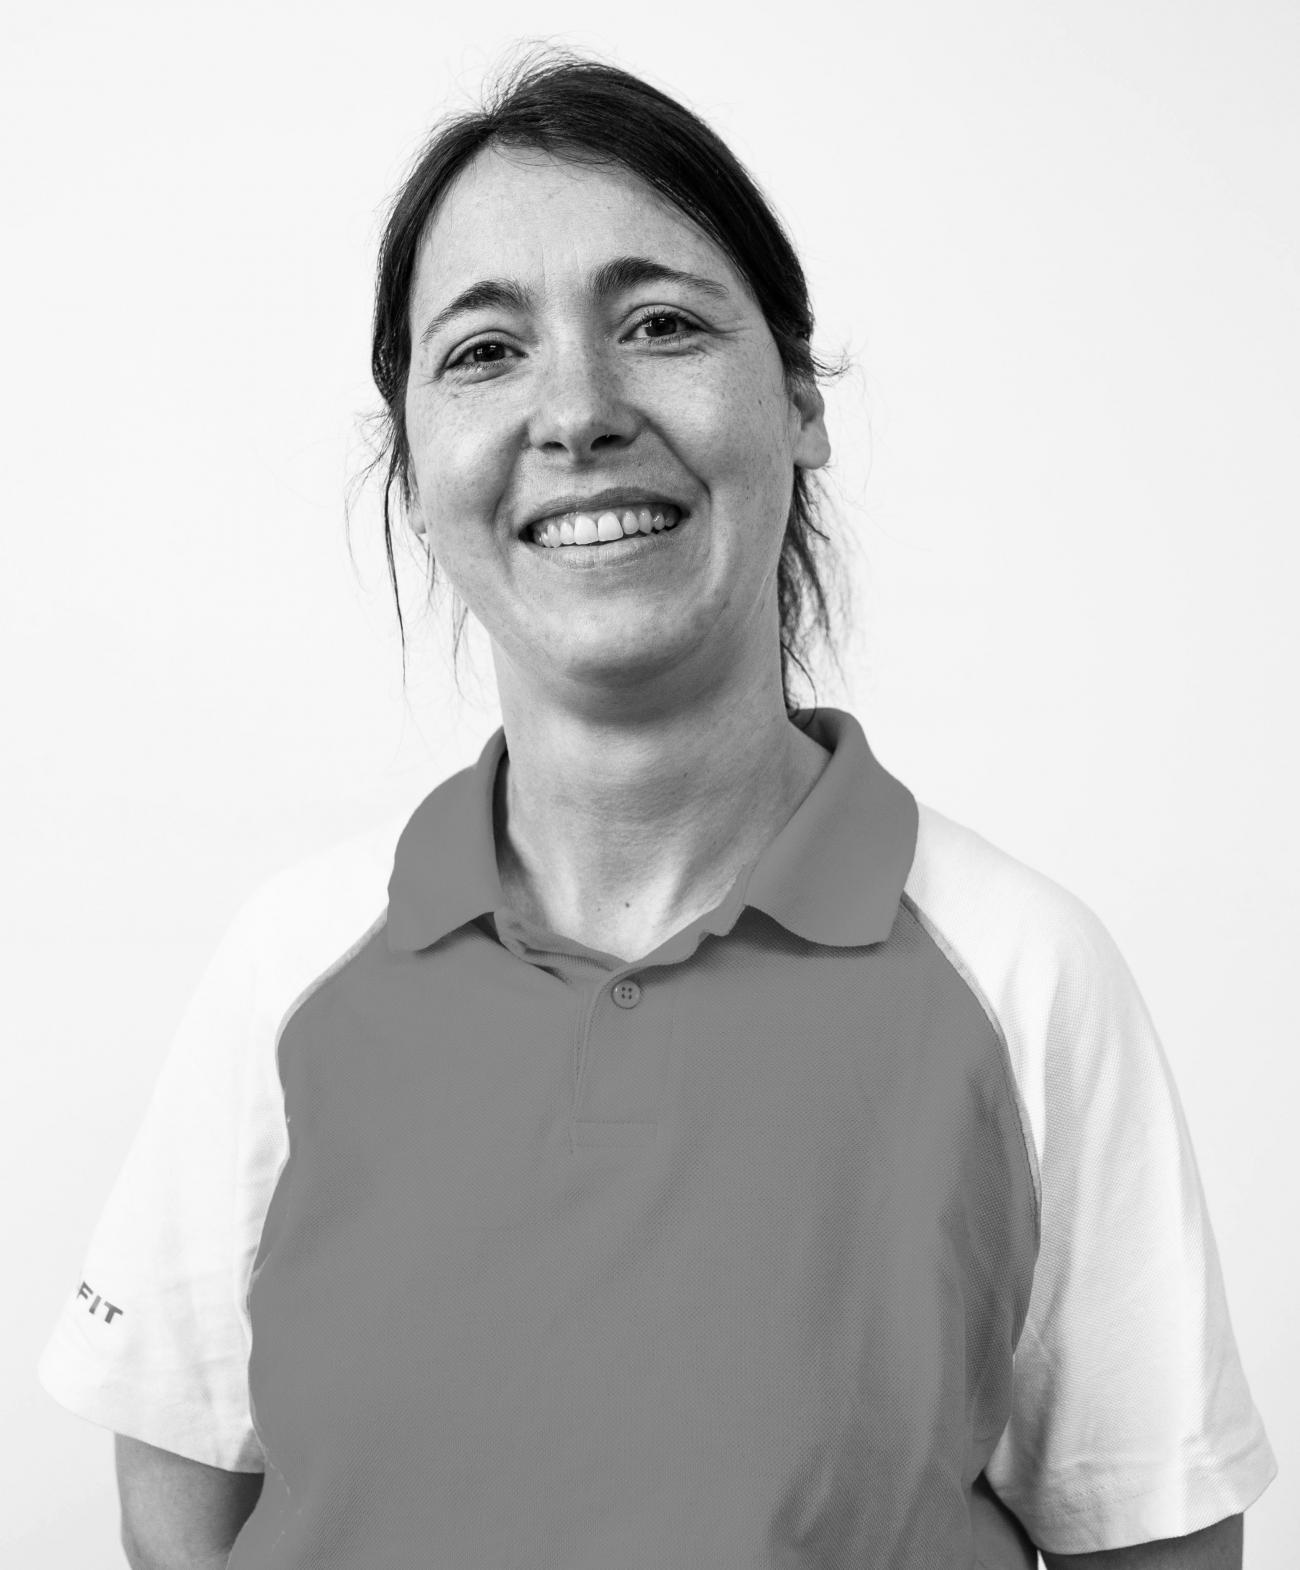 Janina Twisselmann